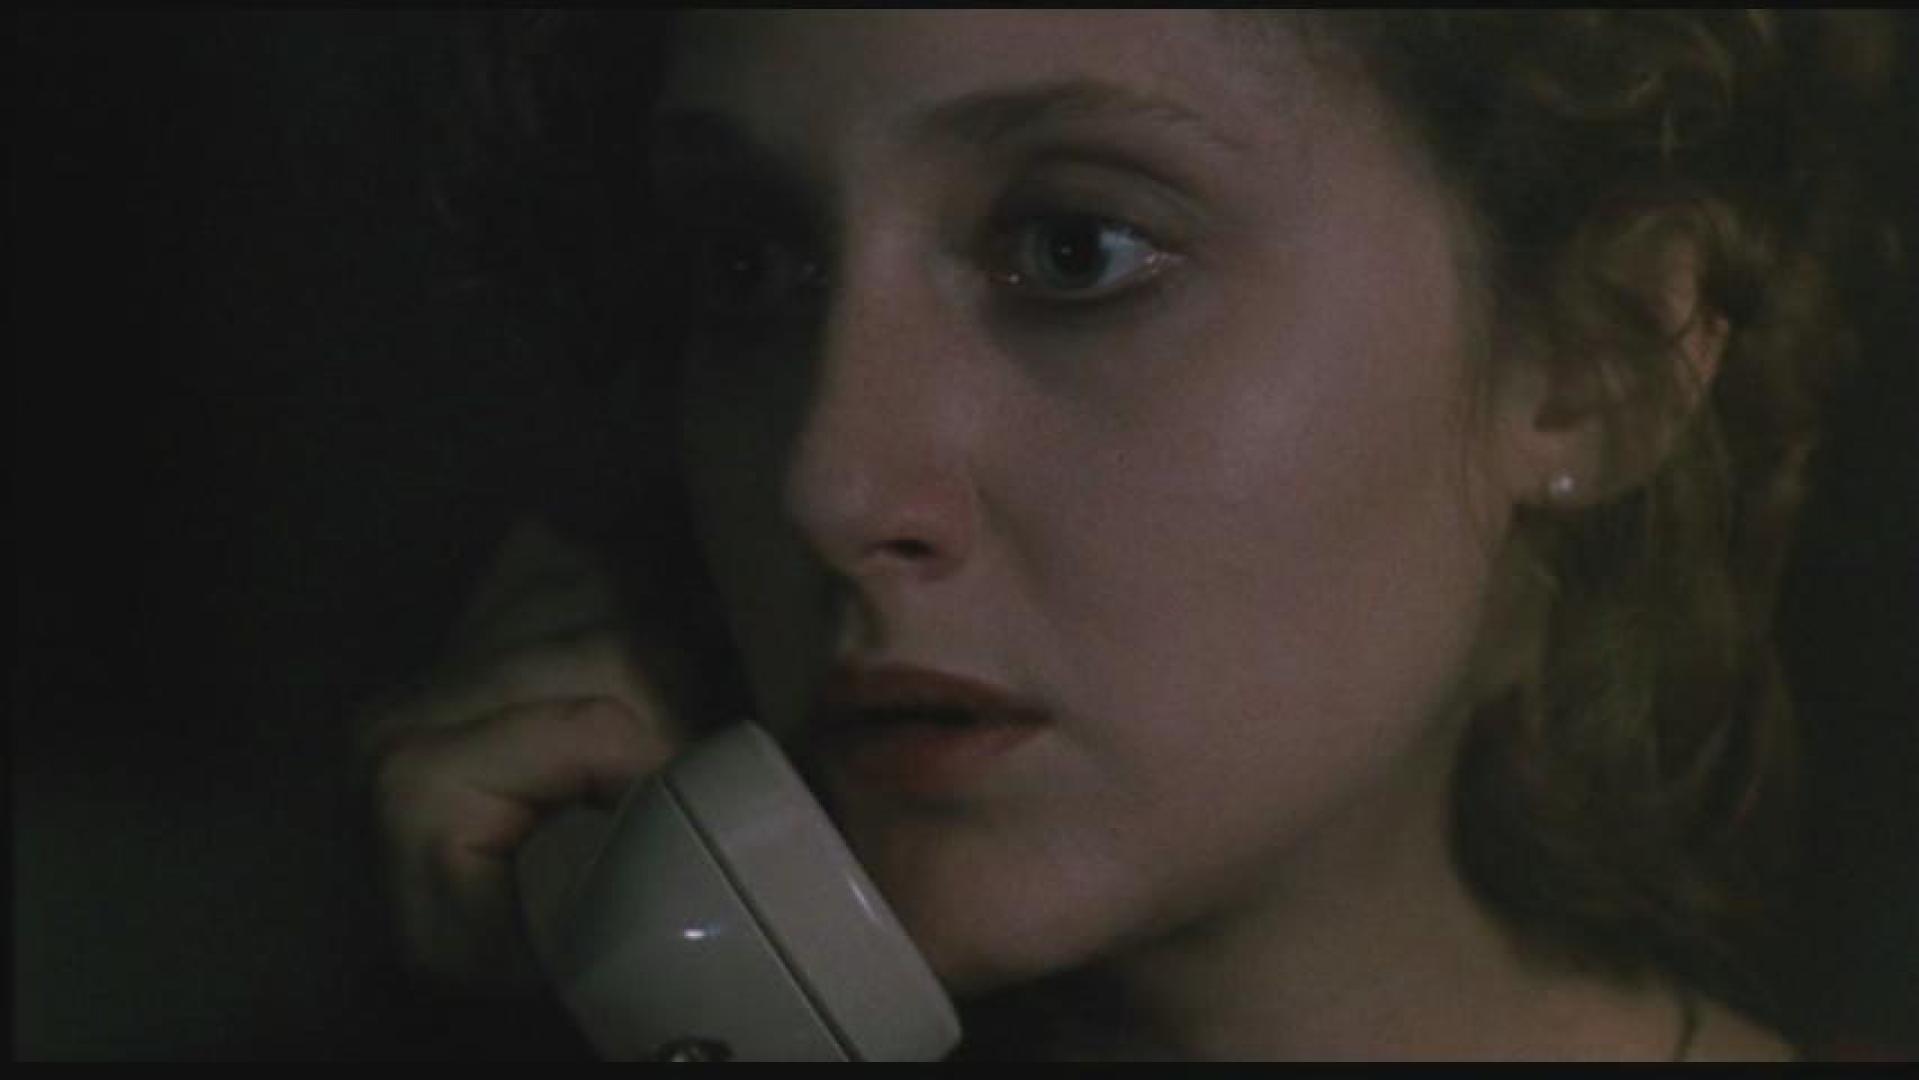 When a Stranger Calls [Back] - Ismeretlen hívás 1-2 (1979/1993)